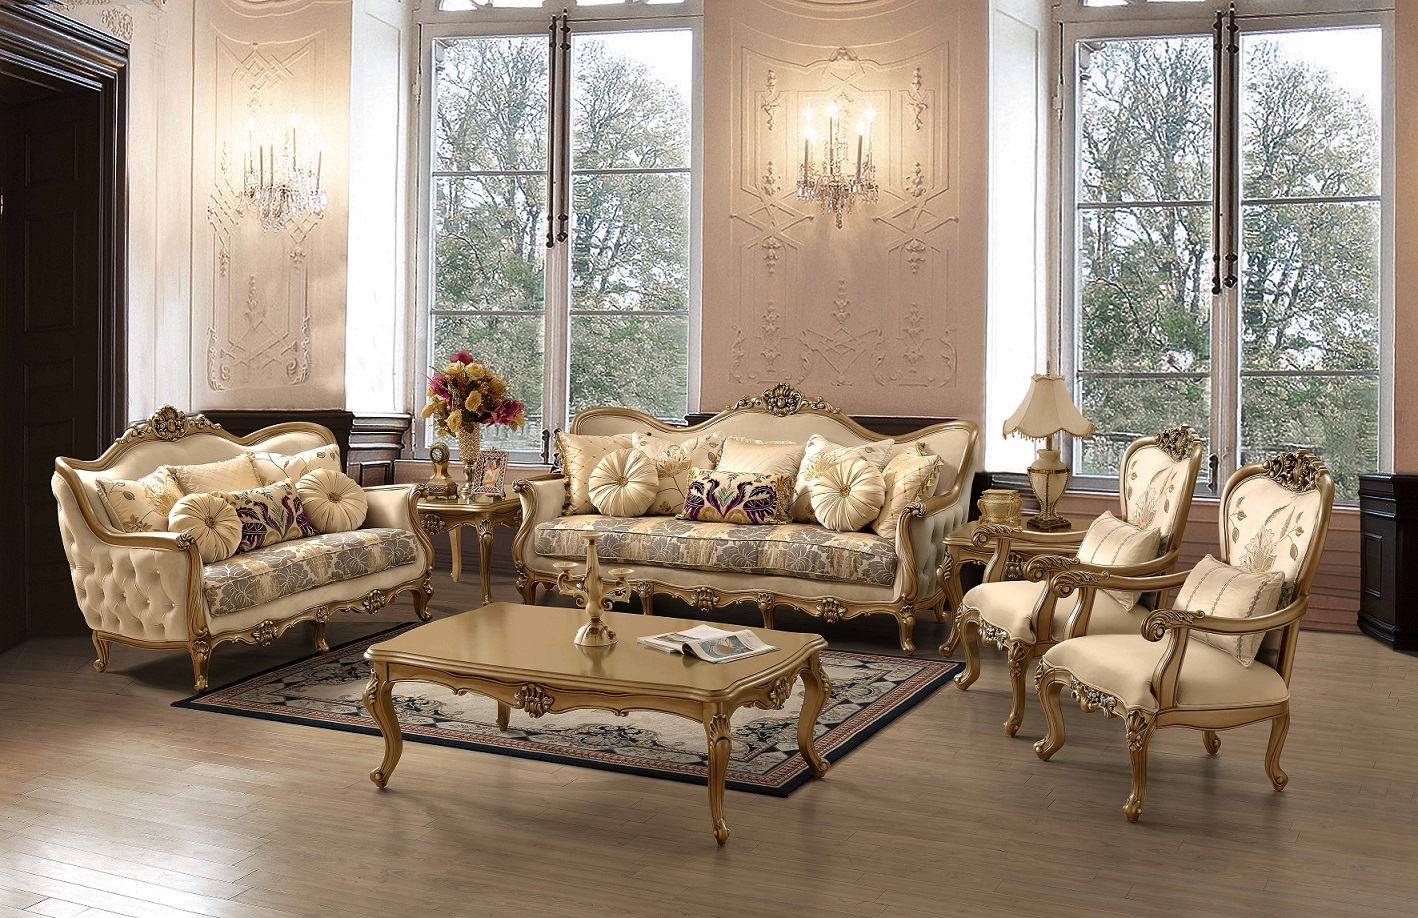 Victorian Living Room G-606